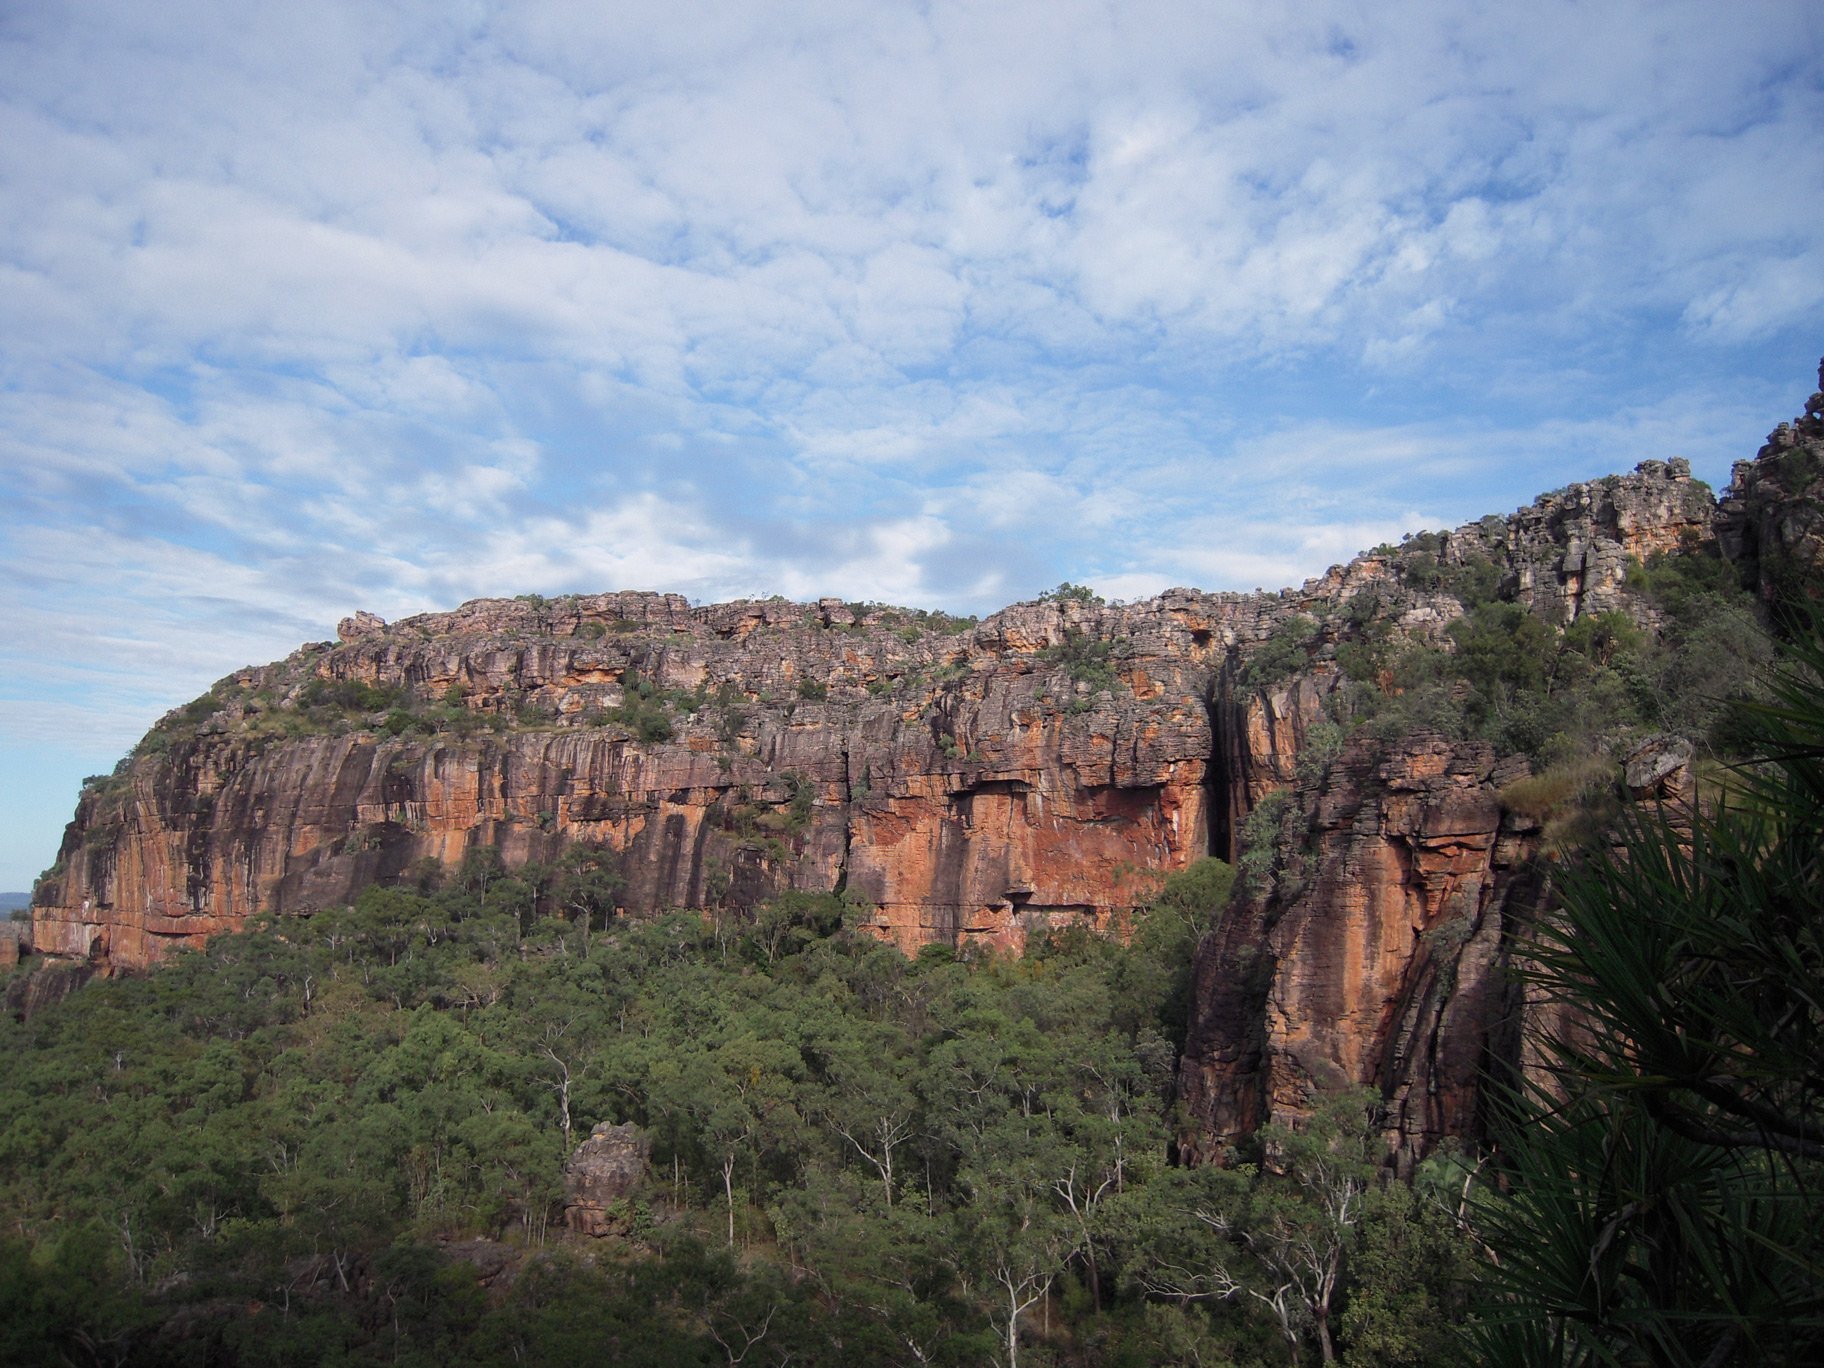 Burrunggui rock erosion